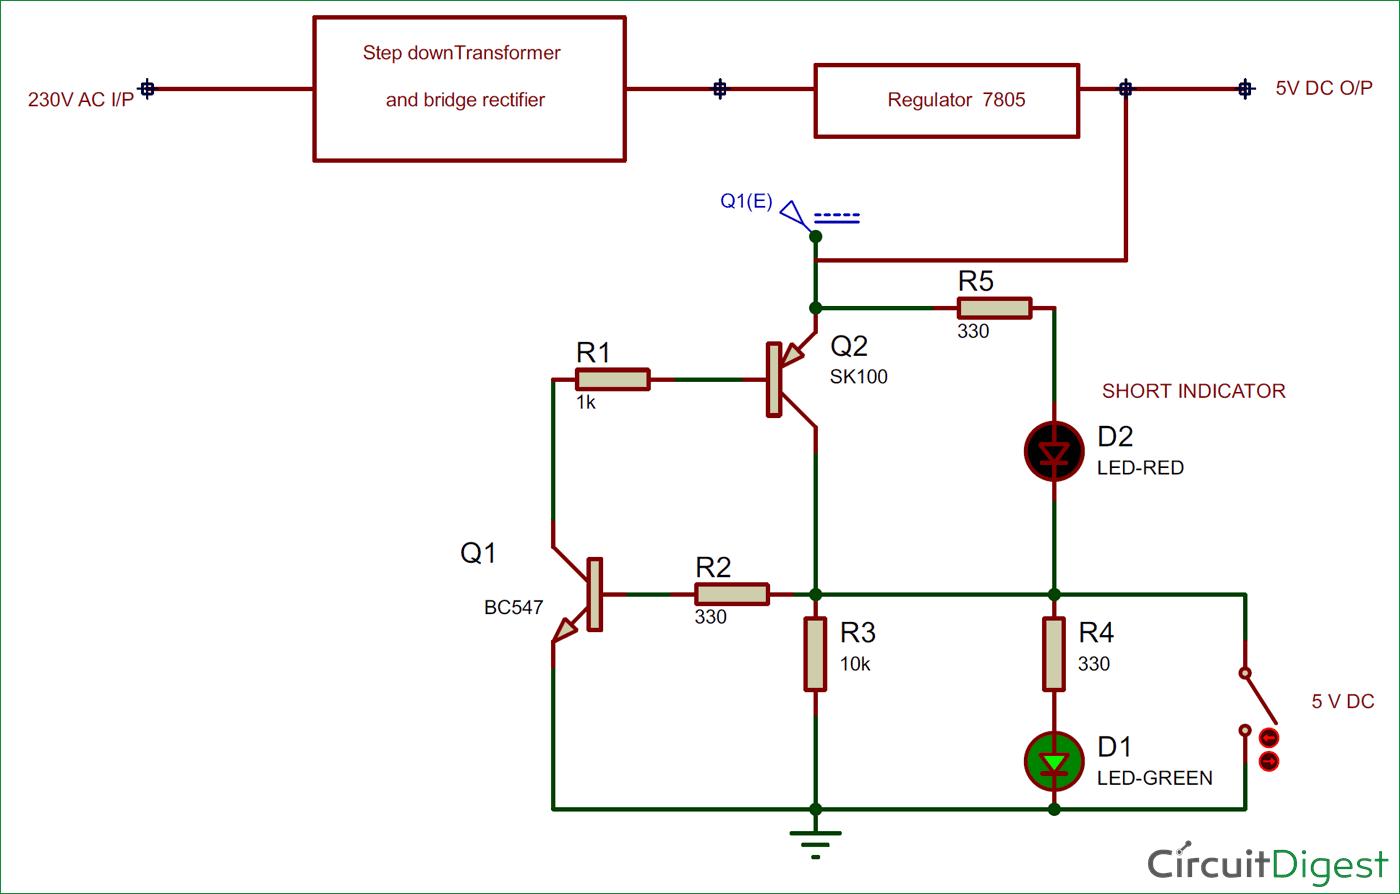 Pleasant Simple Short Circuit Diagram Short Circuit Protection Circuit Wiring Cloud Hisonepsysticxongrecoveryedborg